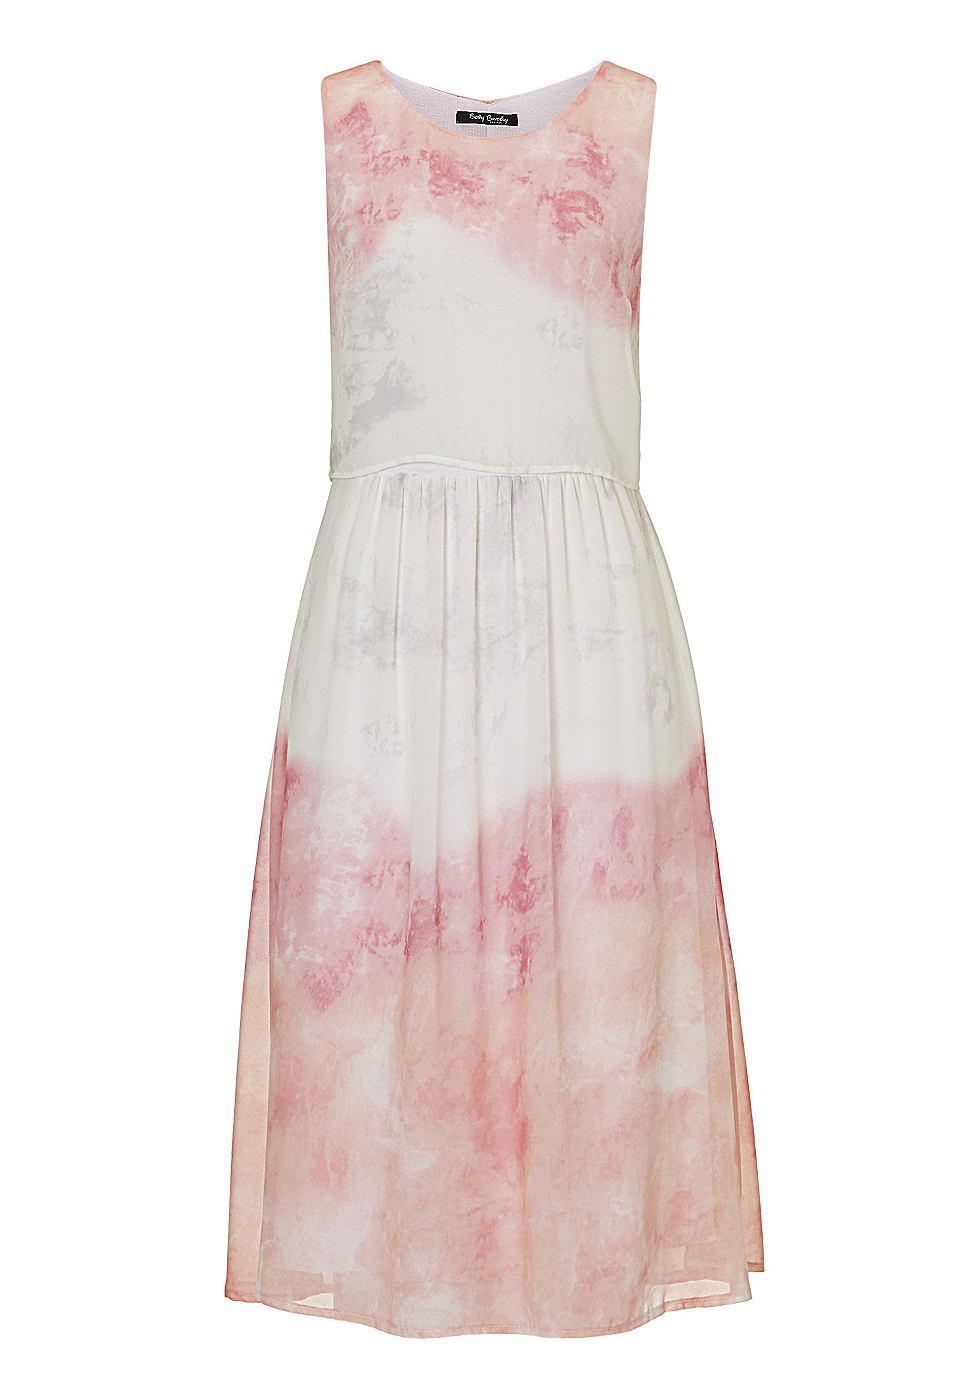 Betty Barclay jurk roze